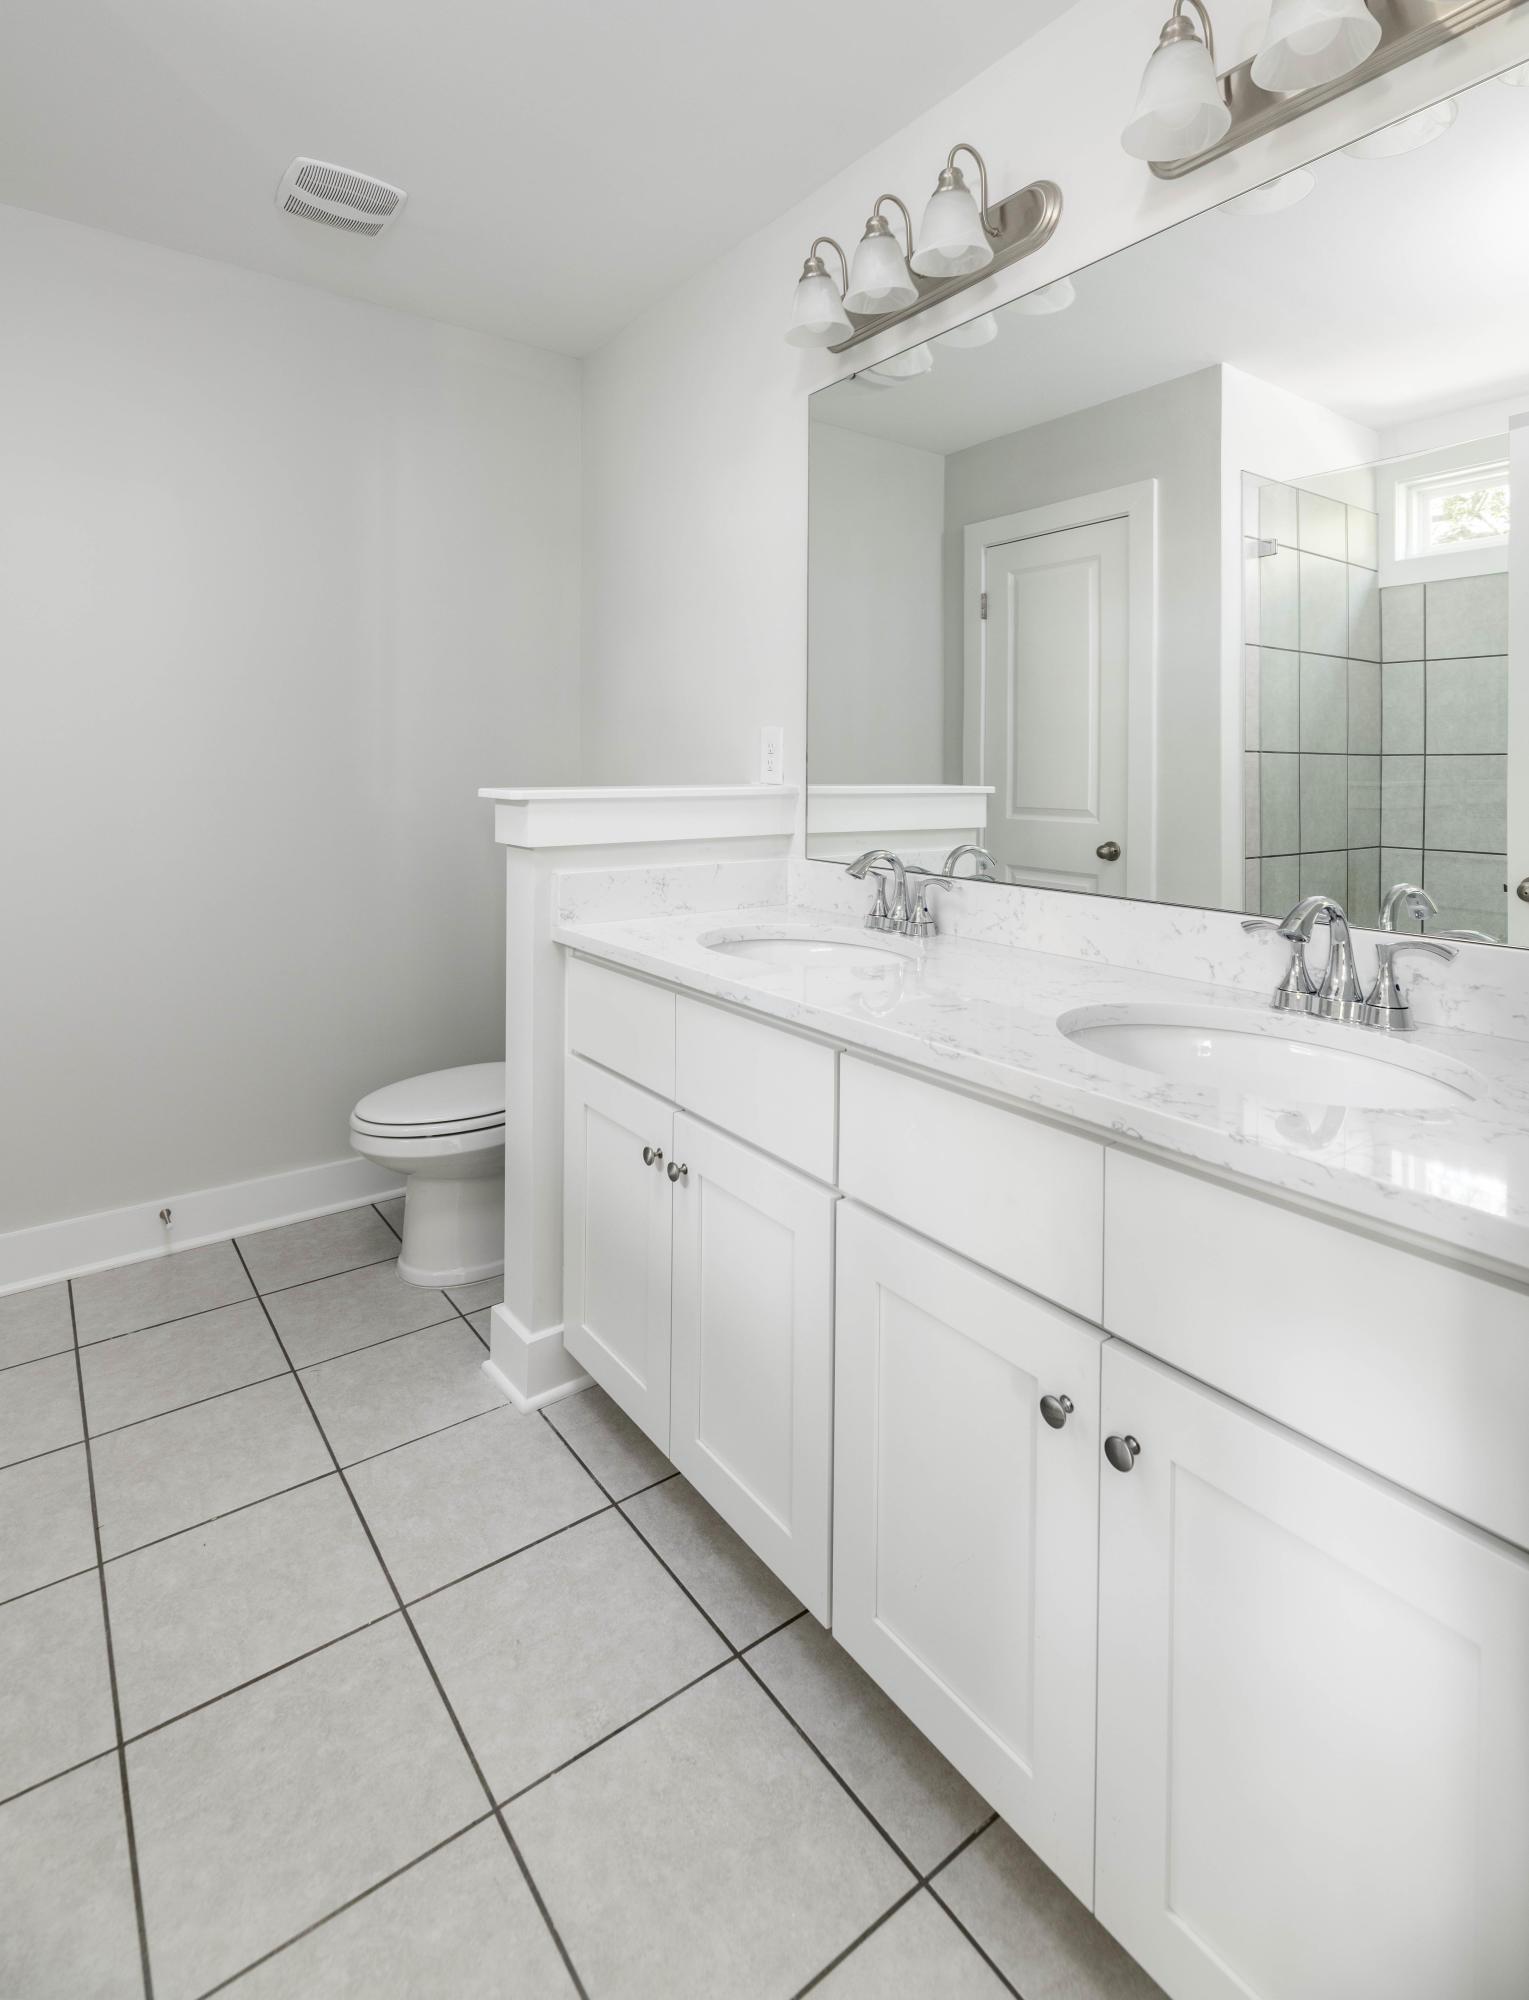 None Homes For Sale - 1242 Schirmer, Mount Pleasant, SC - 13